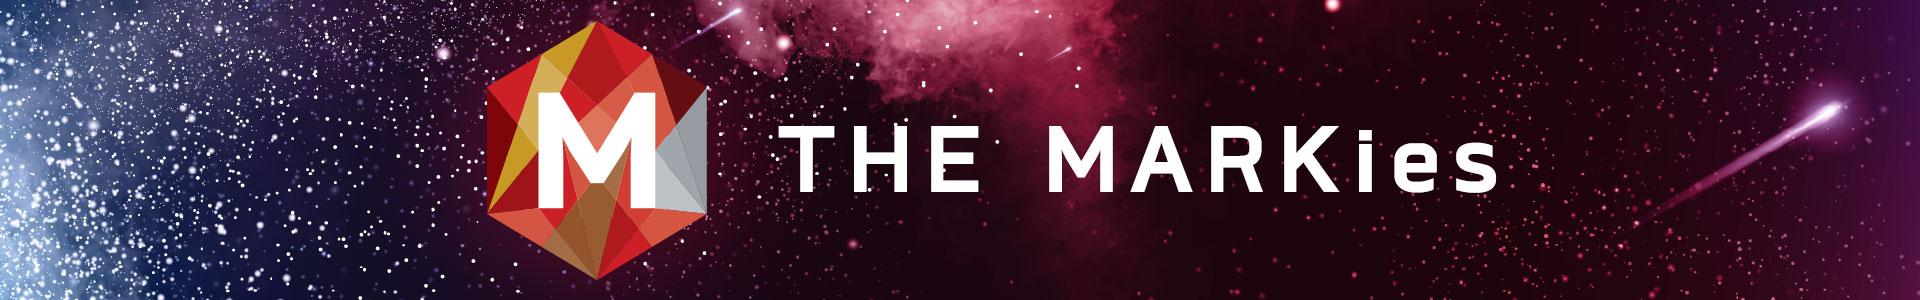 THE-MARKies-banner